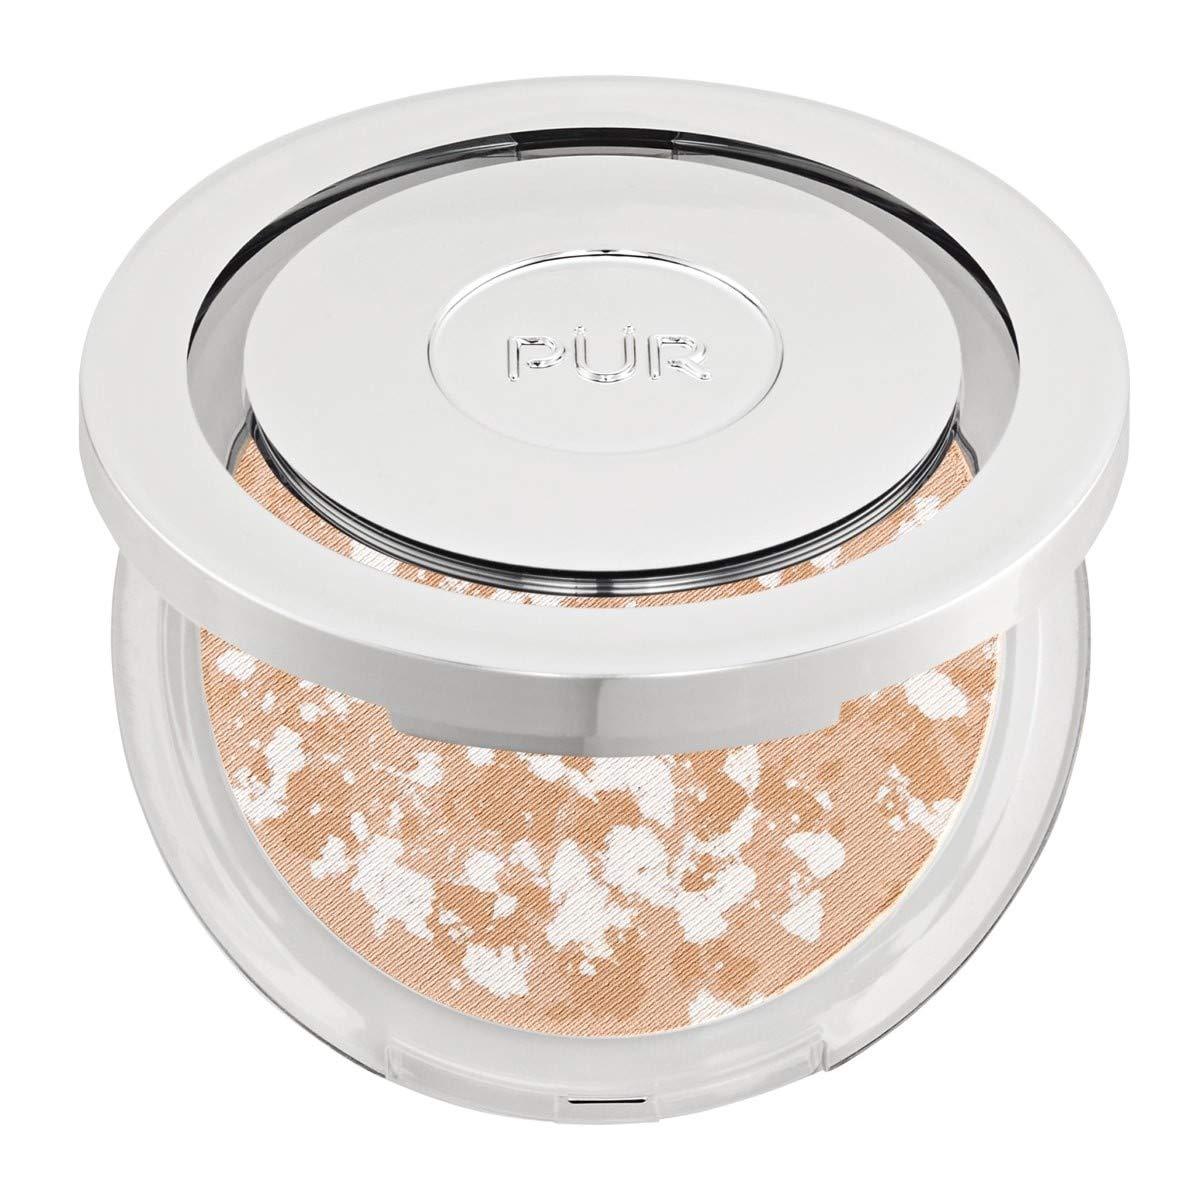 PÜR Balancing Act Mattifying Skin Perfecting Powder, 0.28 Ounce